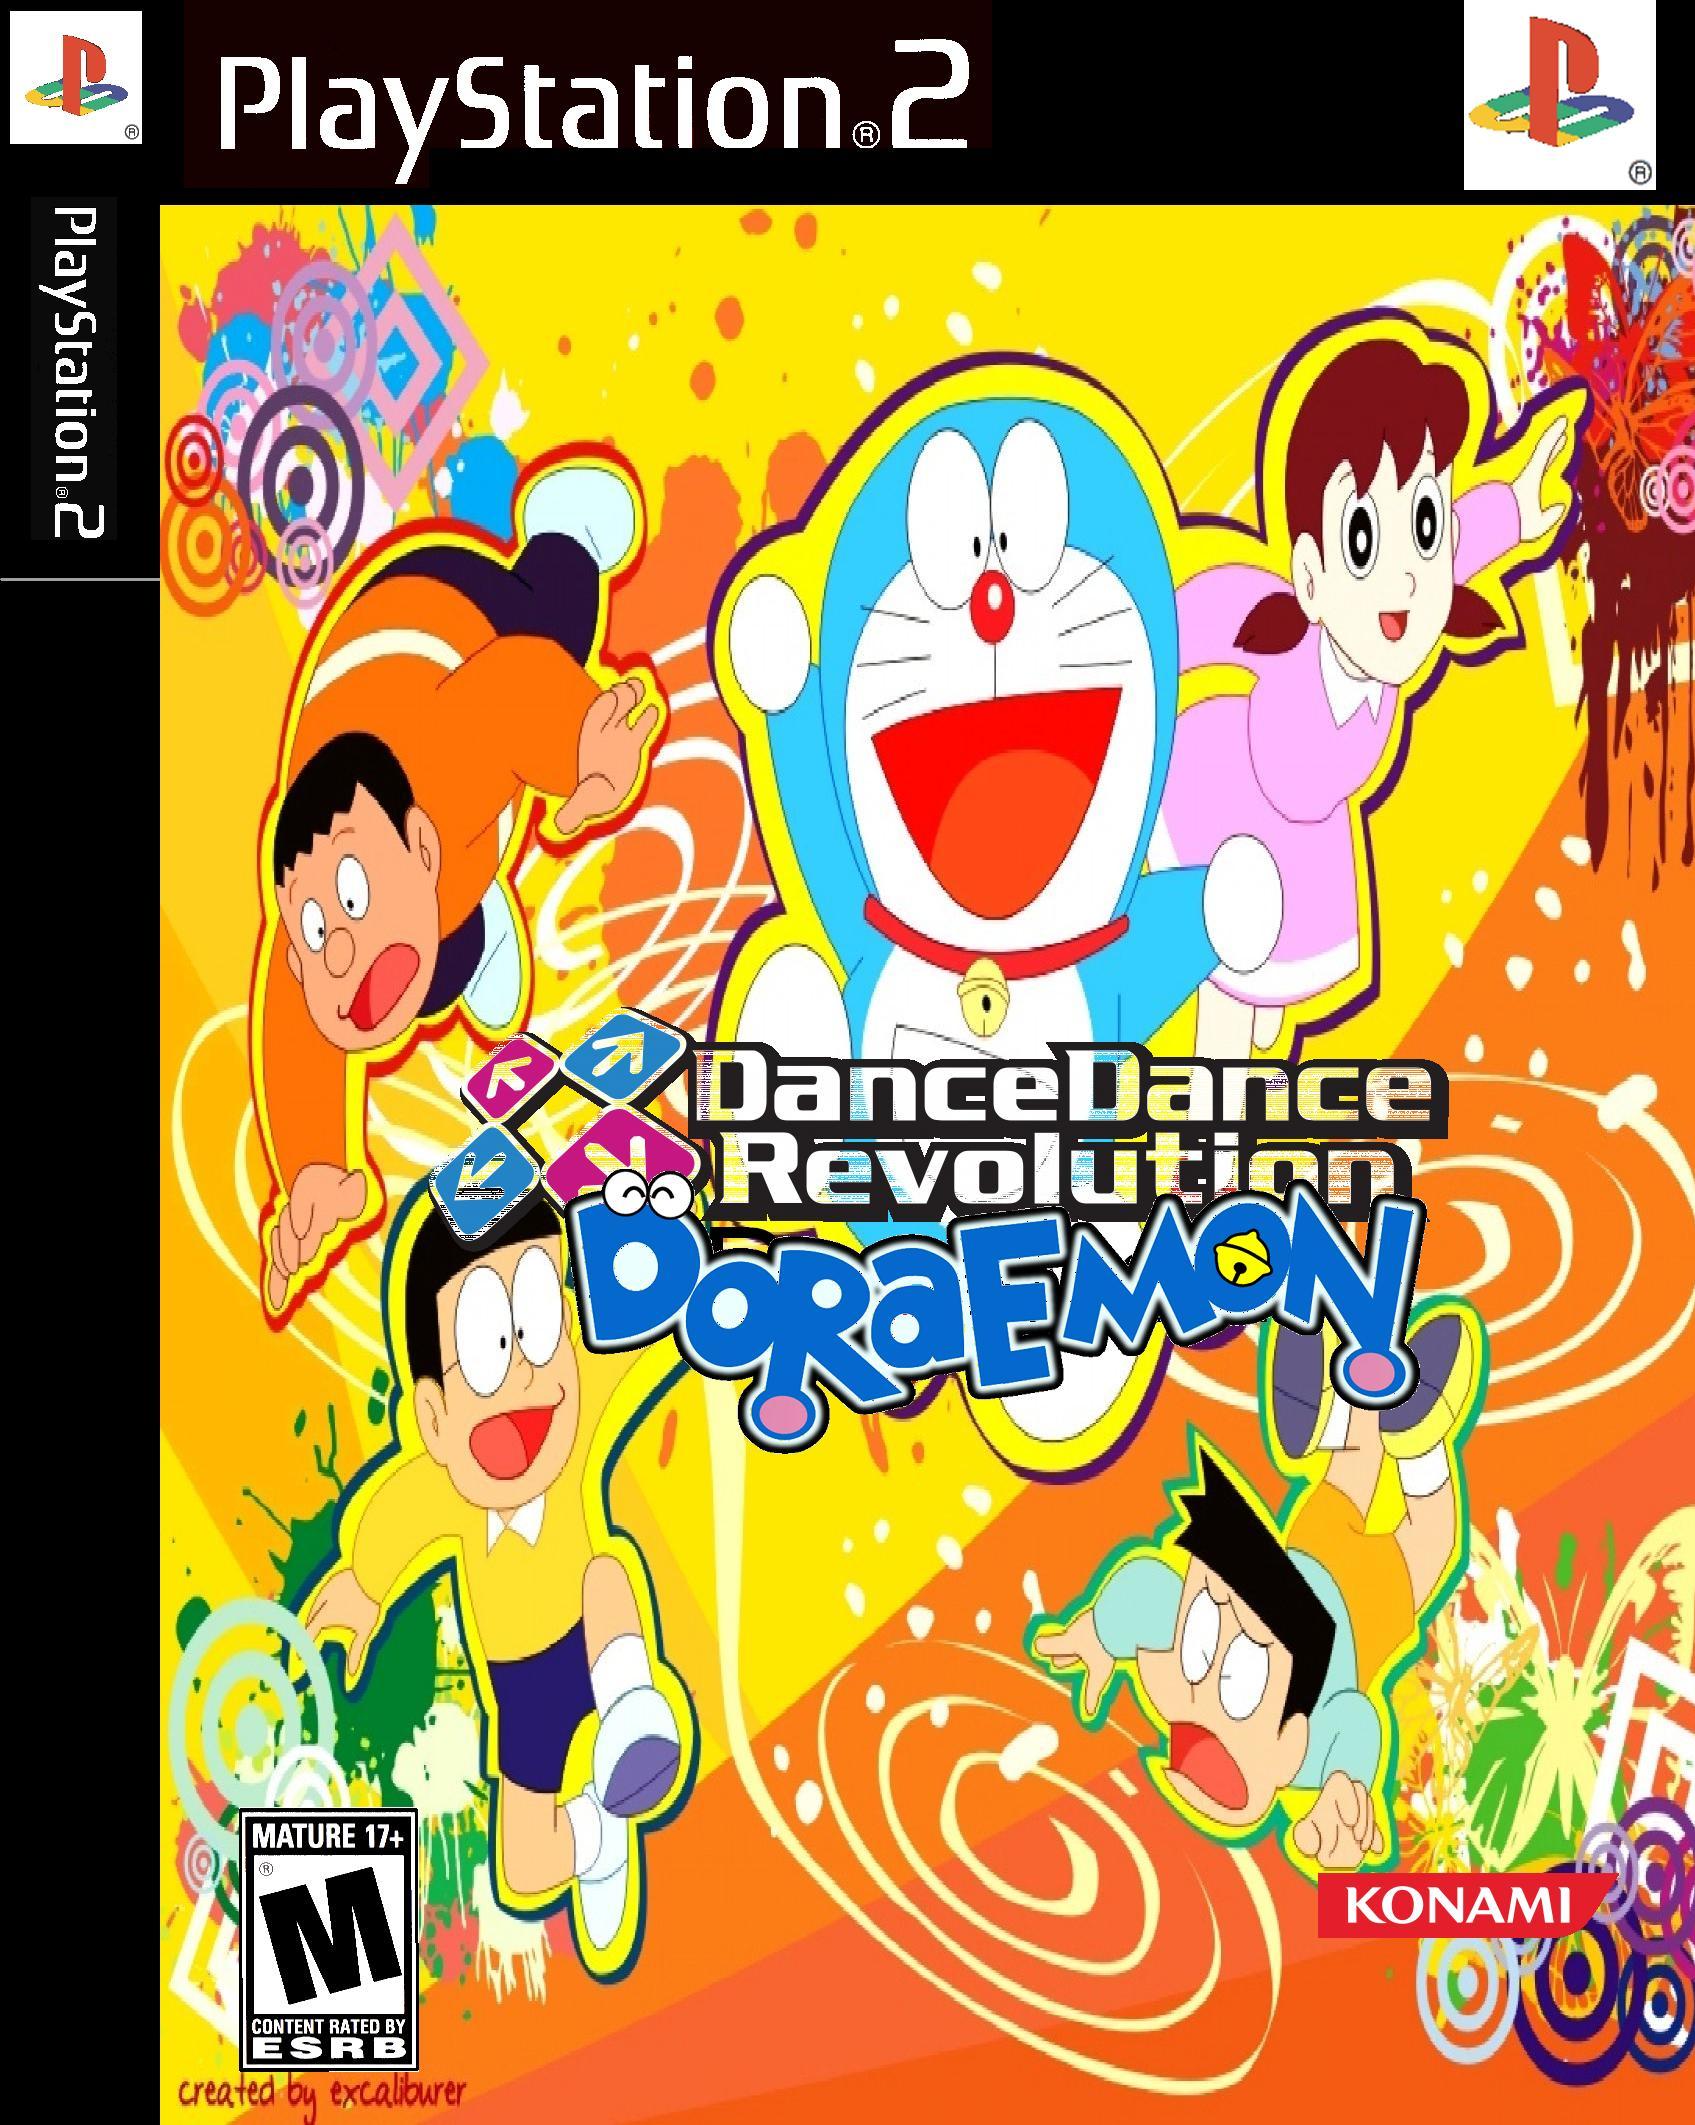 Dance Dance Revolution Doraemon Doraemon Fanon Wiki Fandom